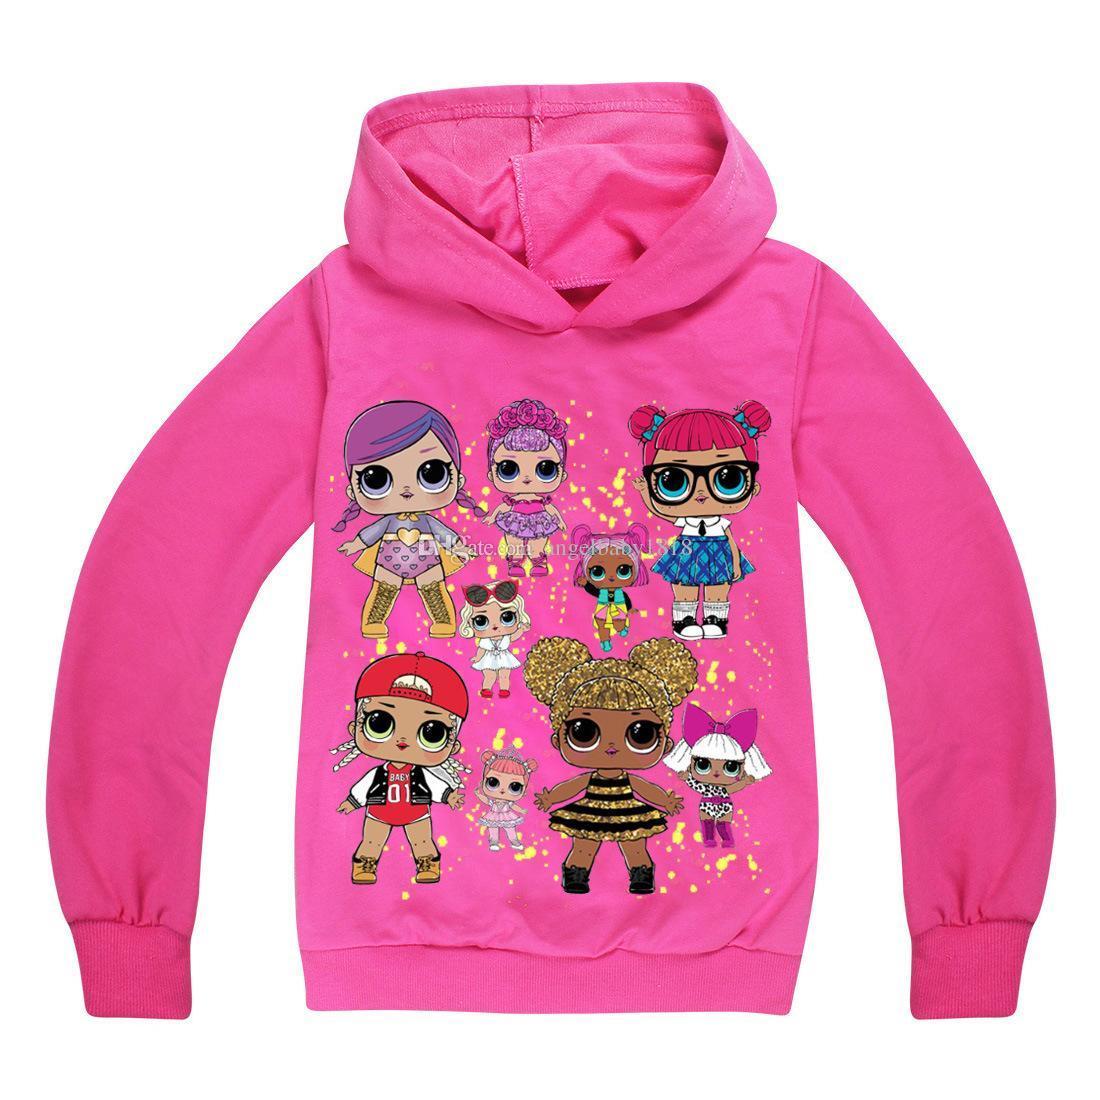 c64662f8e006 2019 4 12Y Baby Girls Hoodie Autumn Children Hoodies Girls Cartoon ...